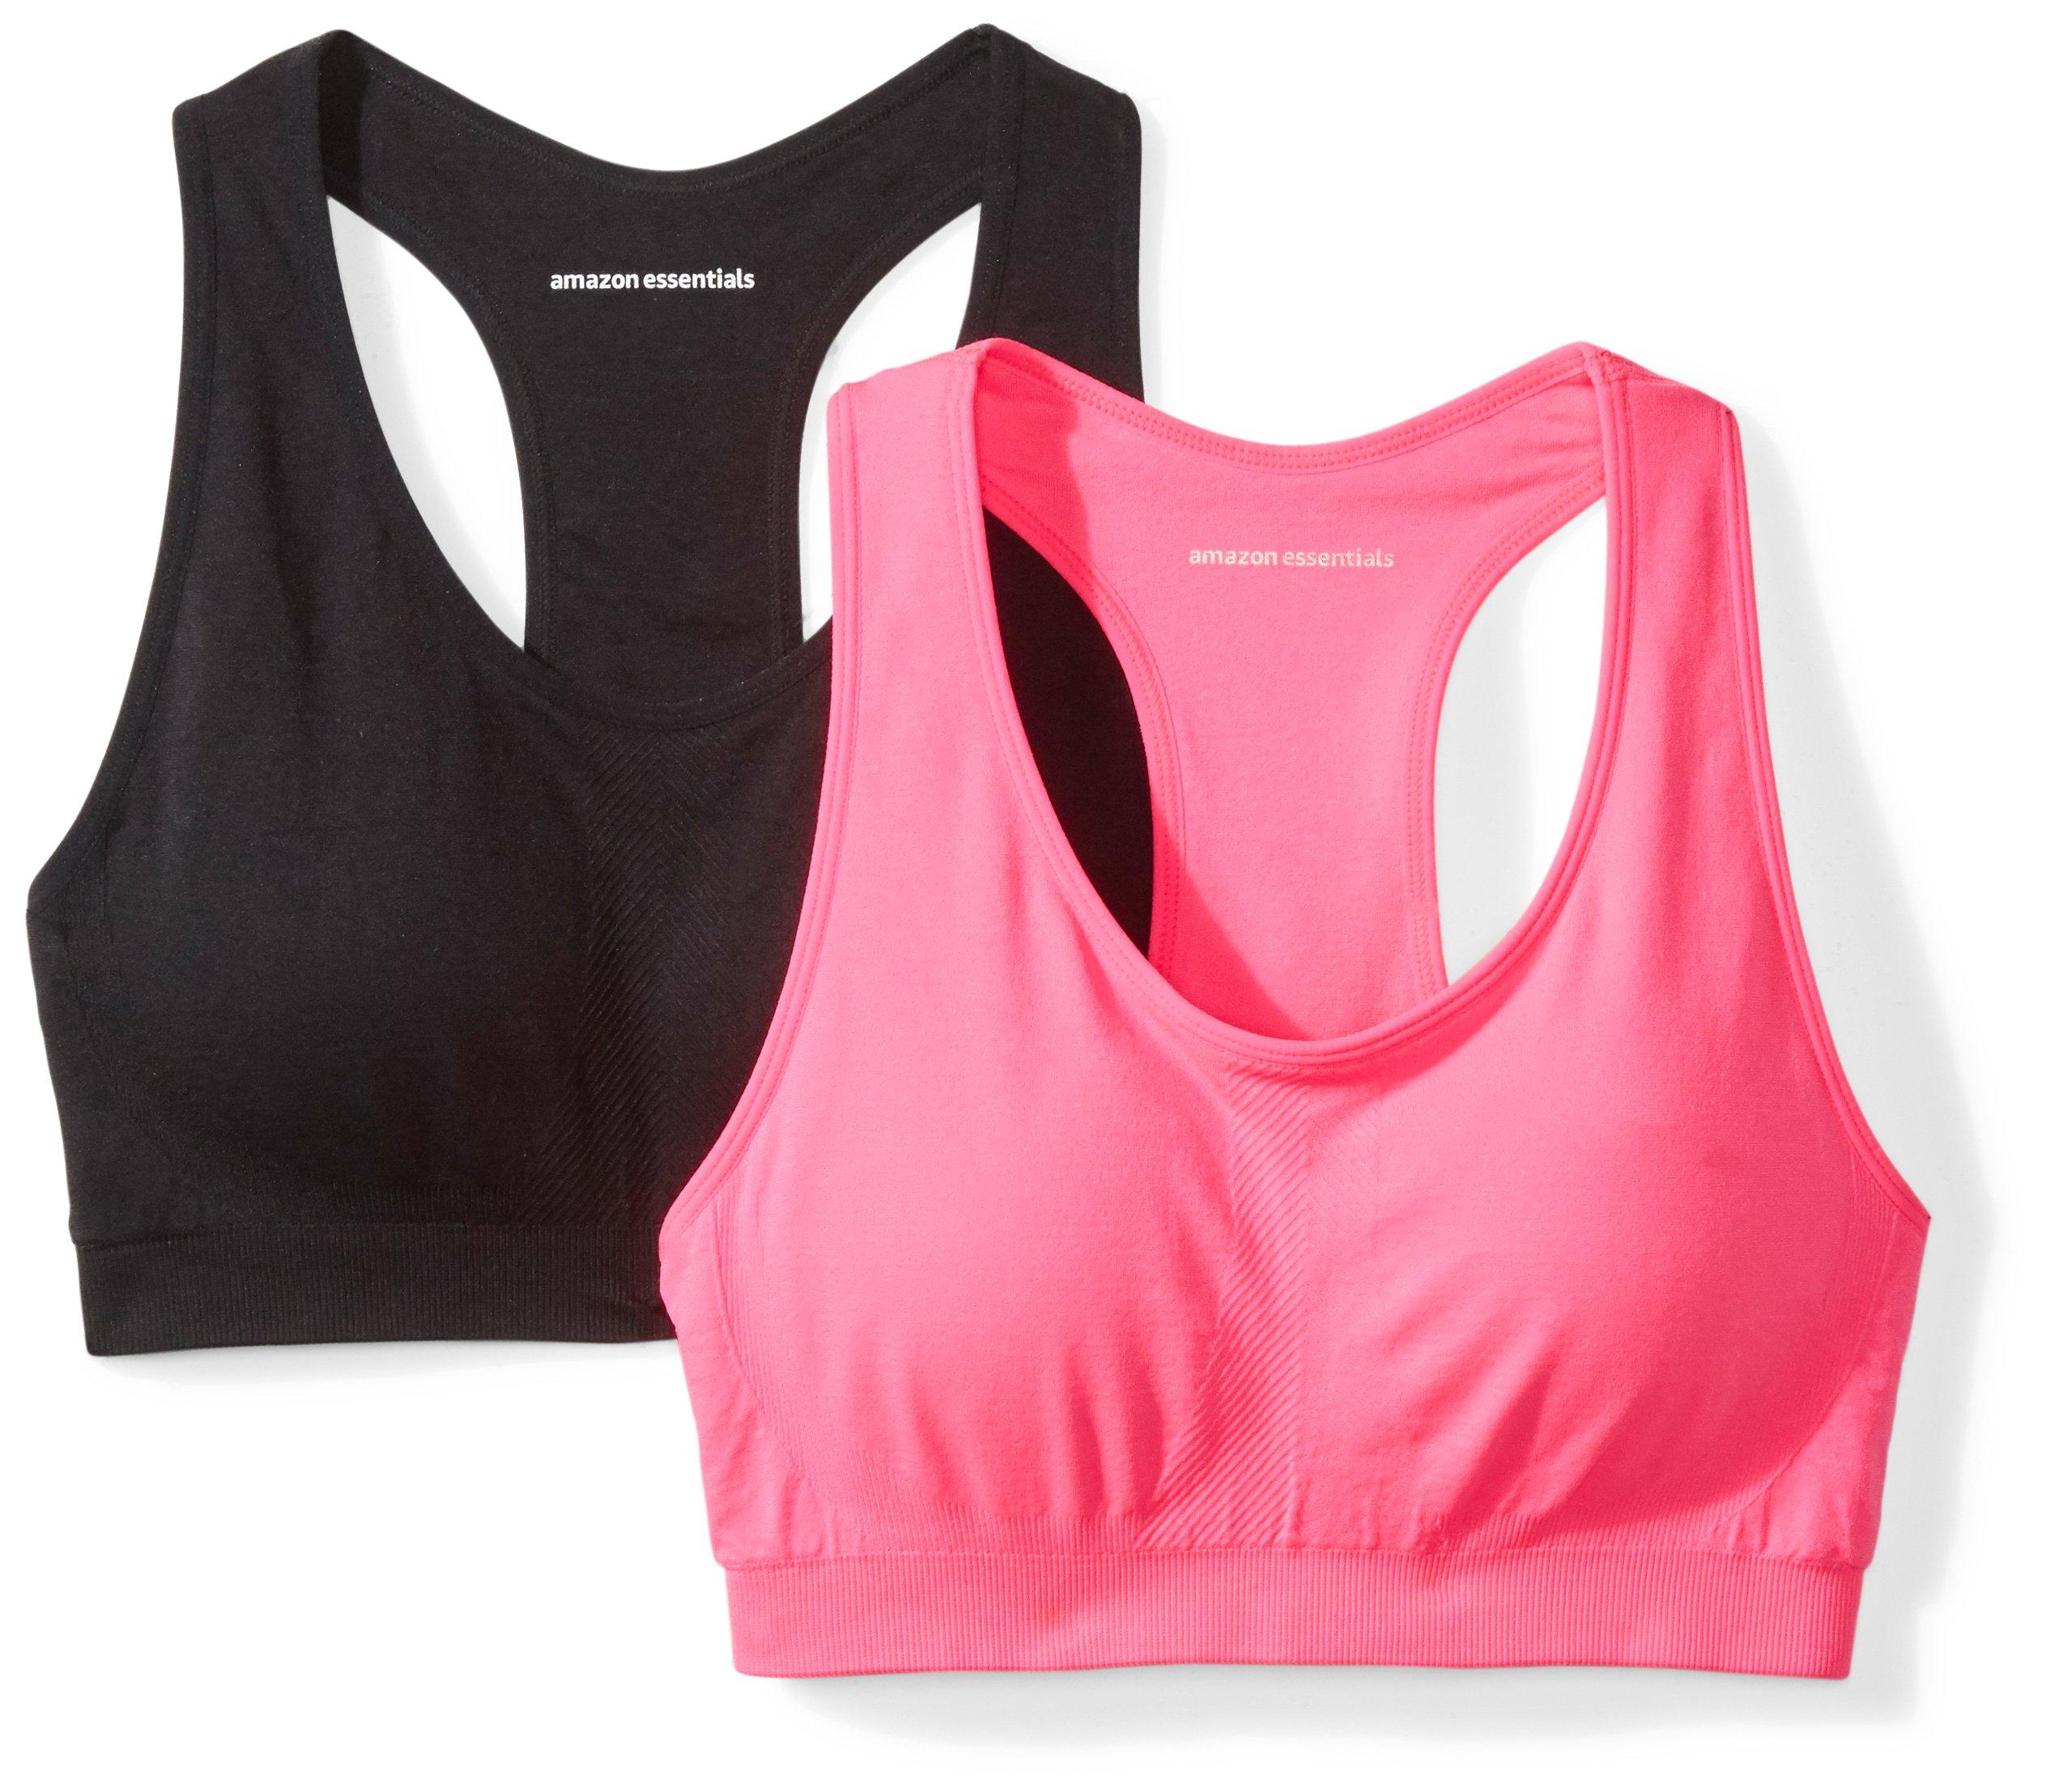 Amazon Essentials Women's 2-Pack Light Support Seamless Sports Bras, Black/Fuchsia Floral, Small